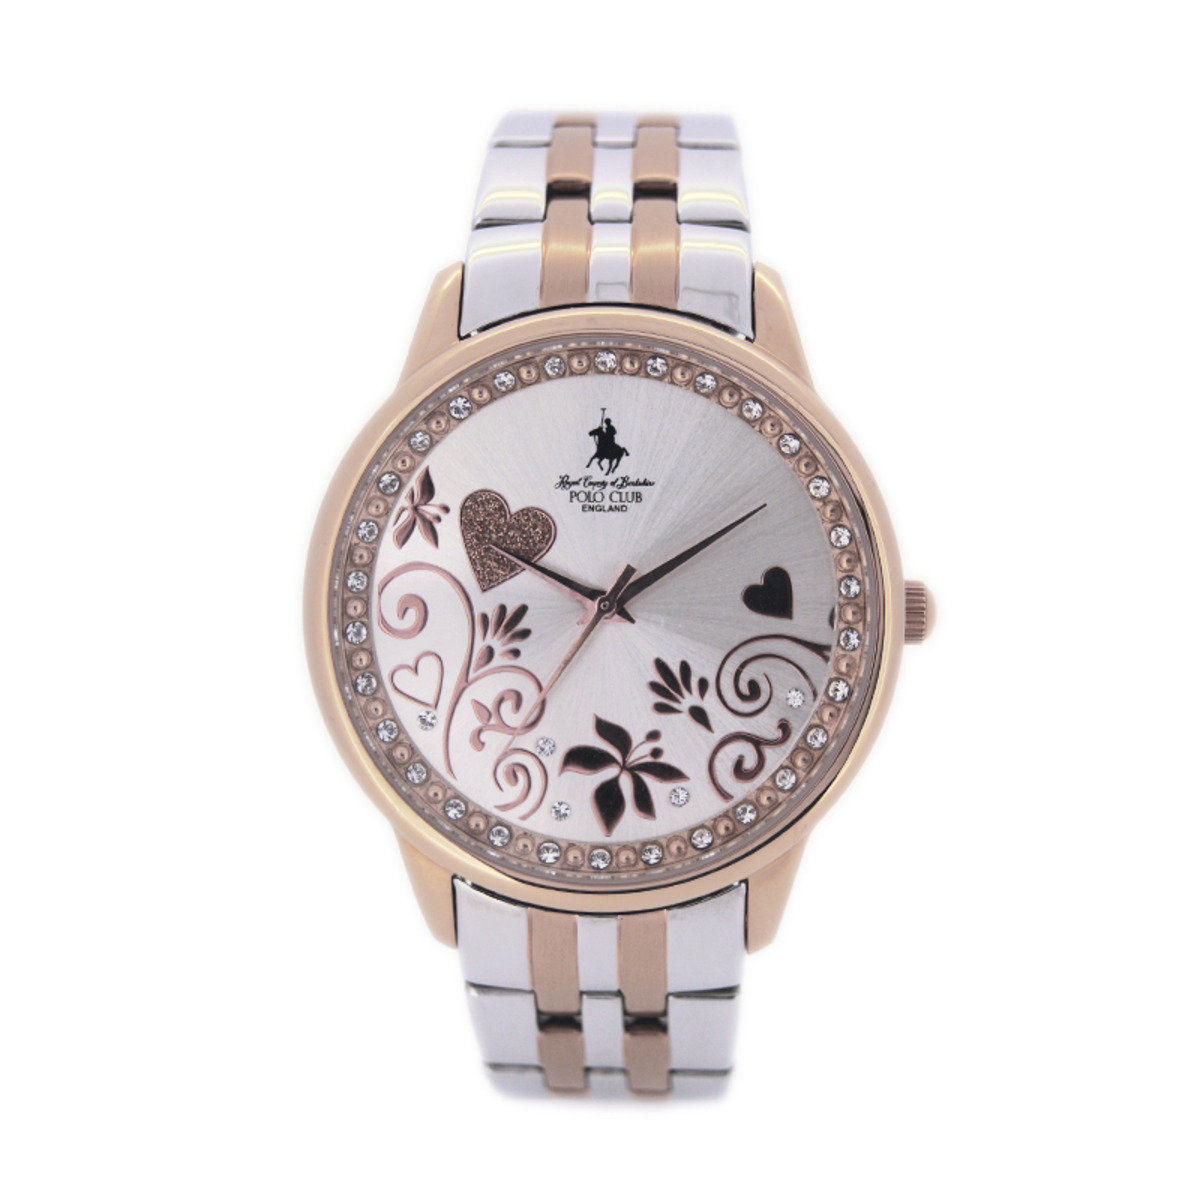 PL165-858RG-S Watch